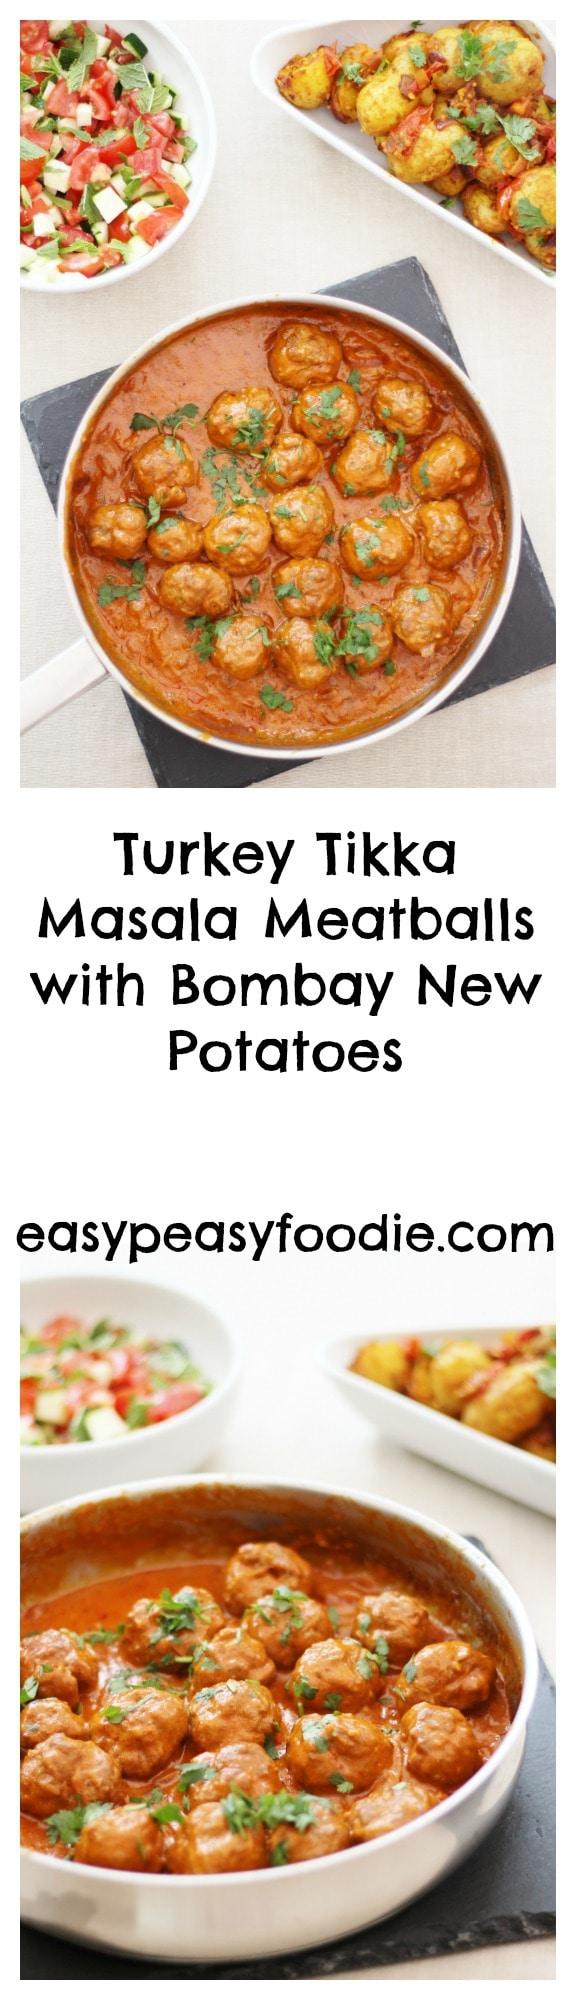 Turkey Tikka Masala Meatballs with Bombay New Potatoes - Pinnable image for Pinterest